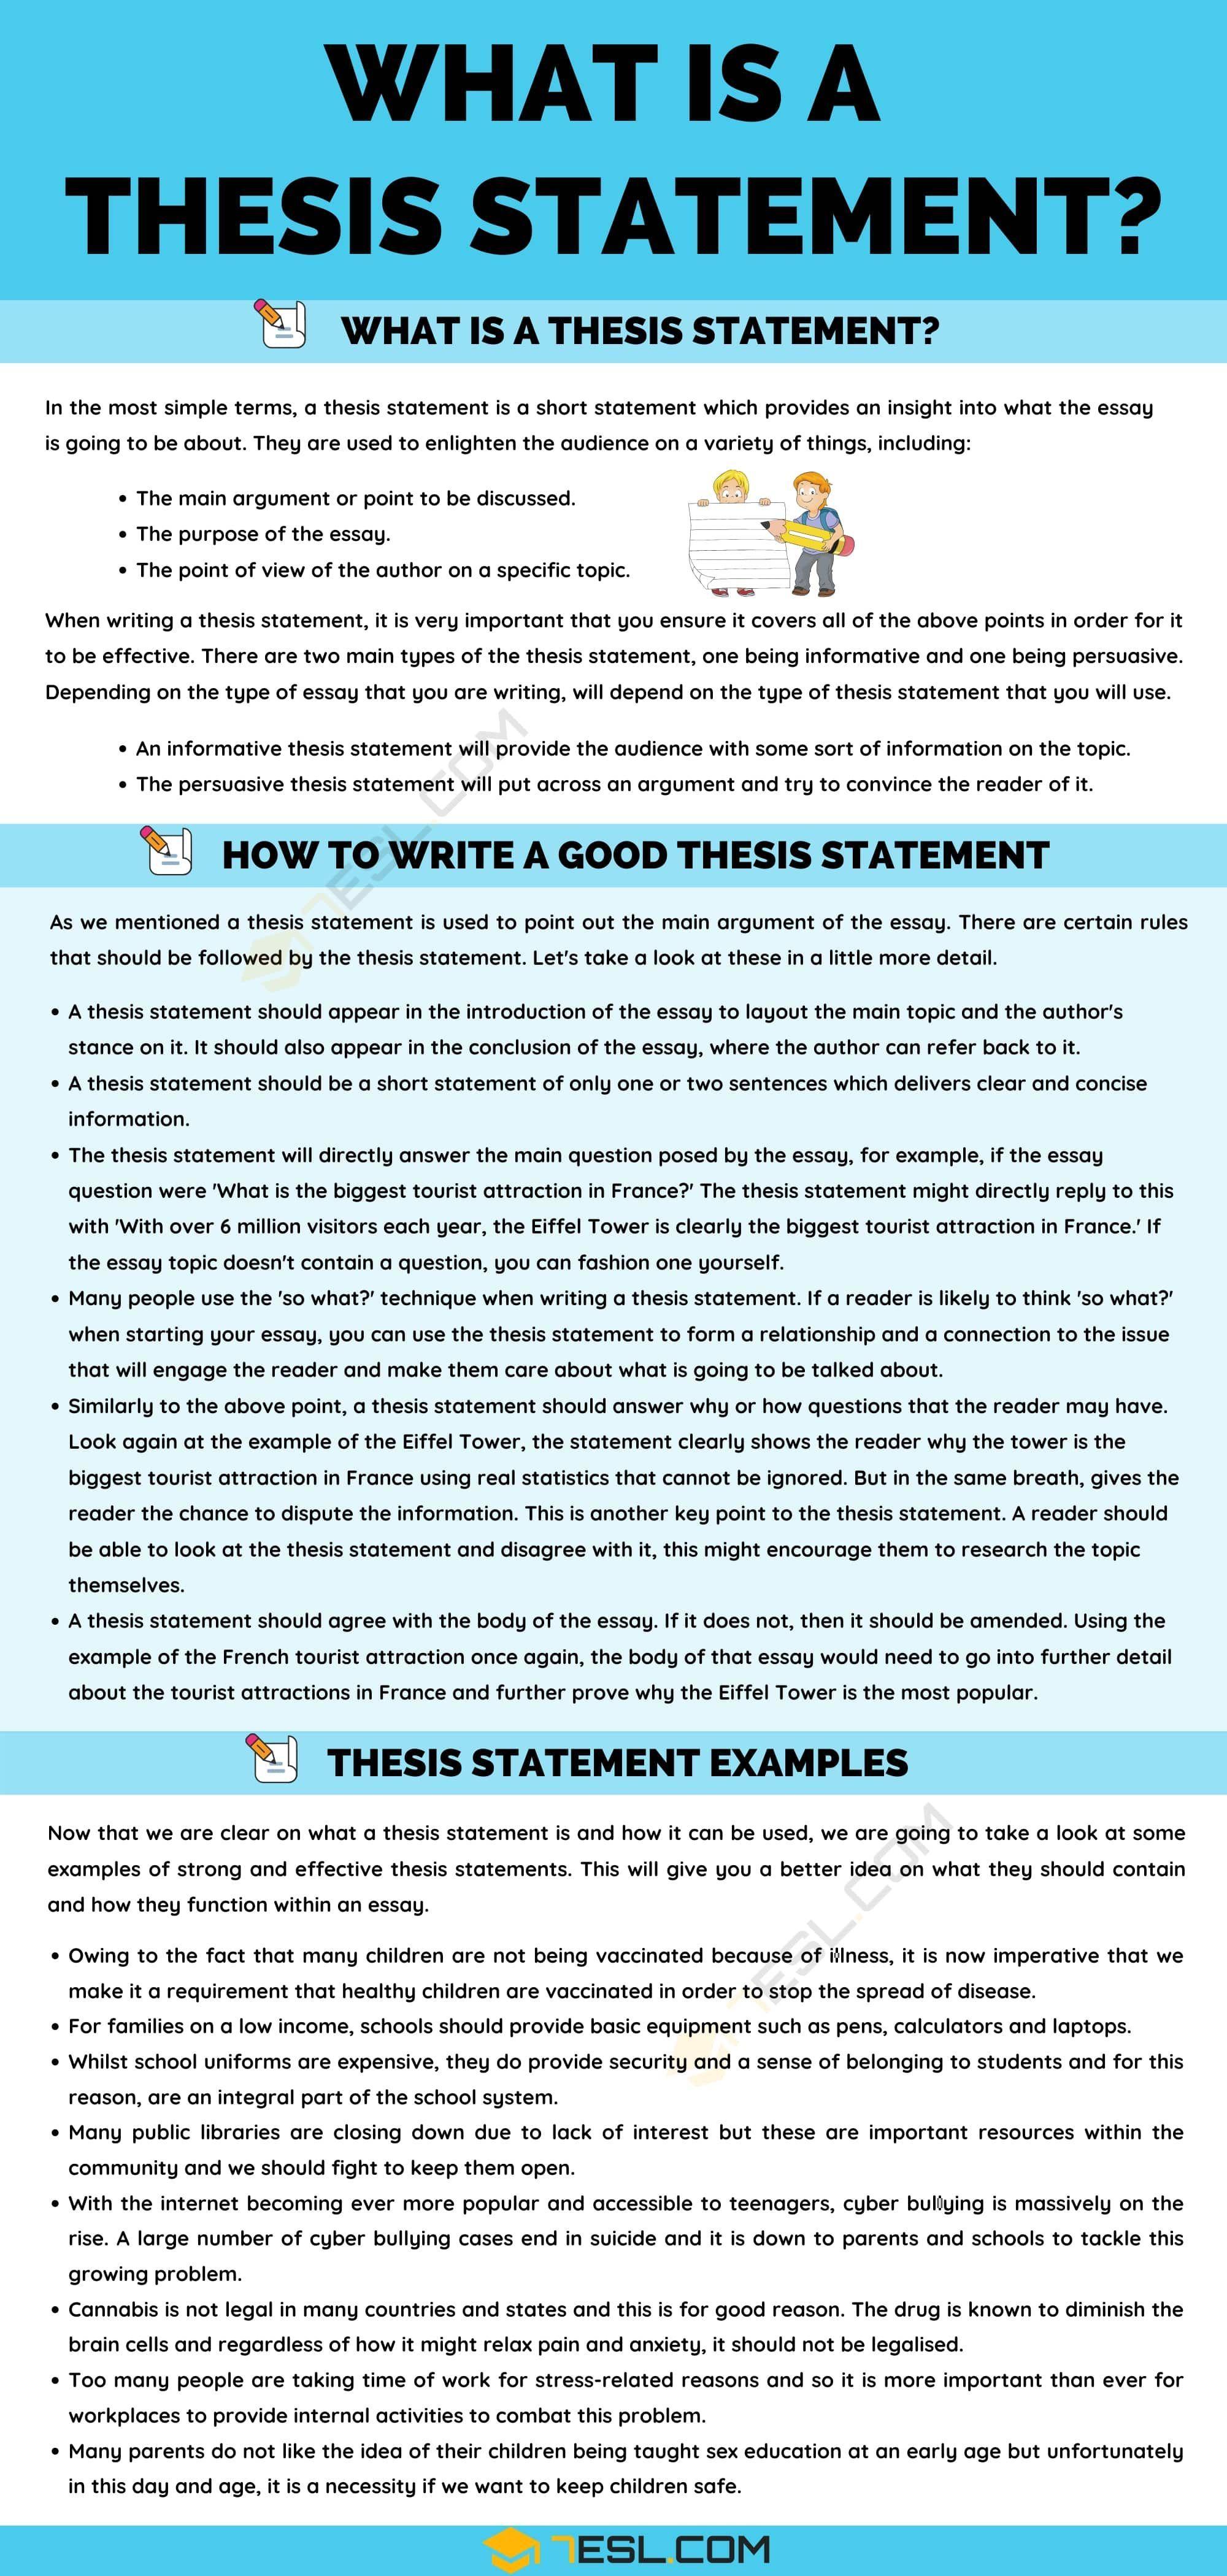 Essay help website logic proofreading website